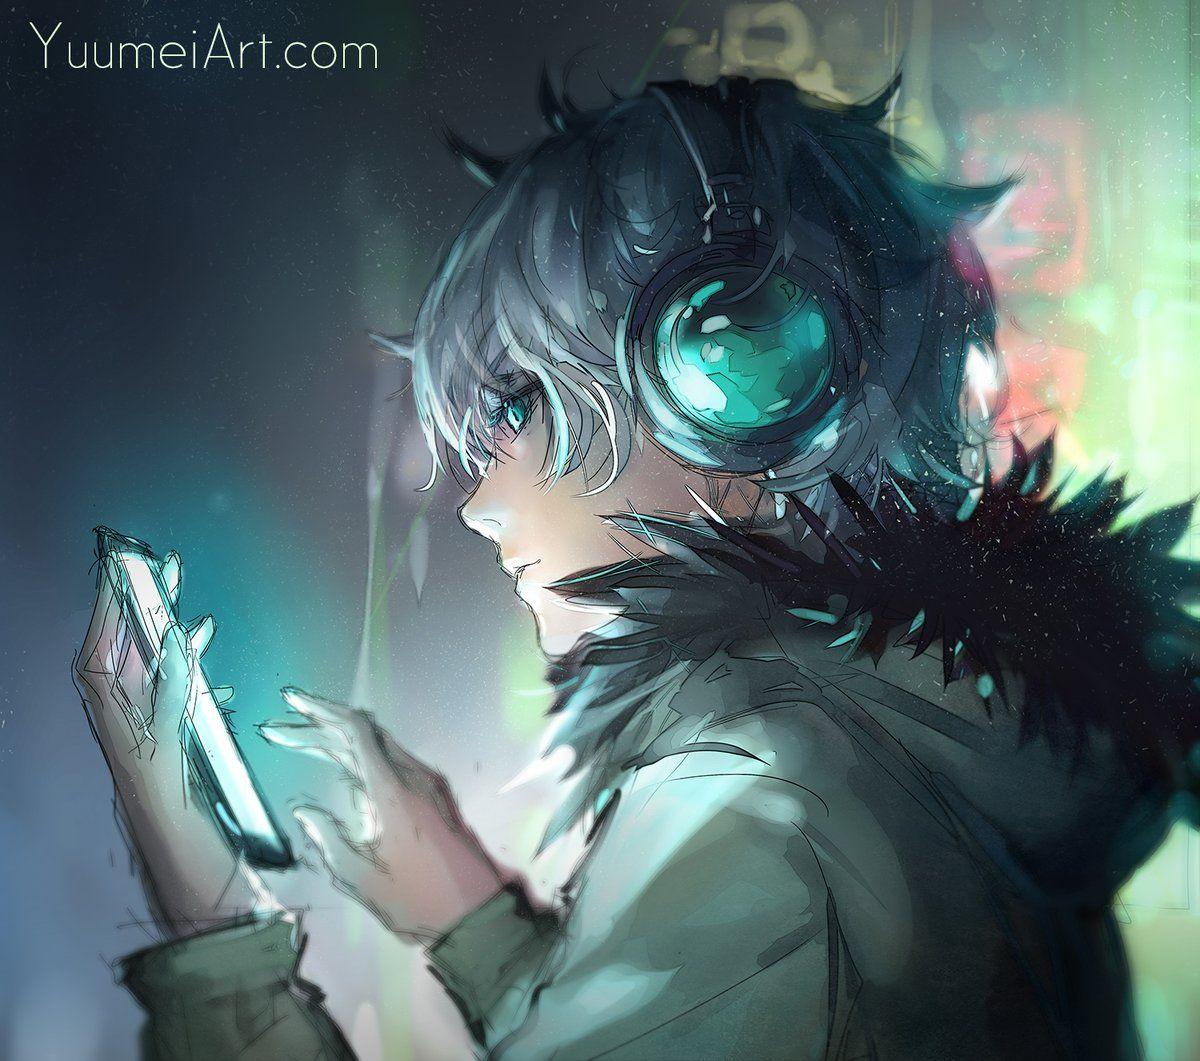 Twitter Fisheye placebo, Anime music, Anime drawings boy